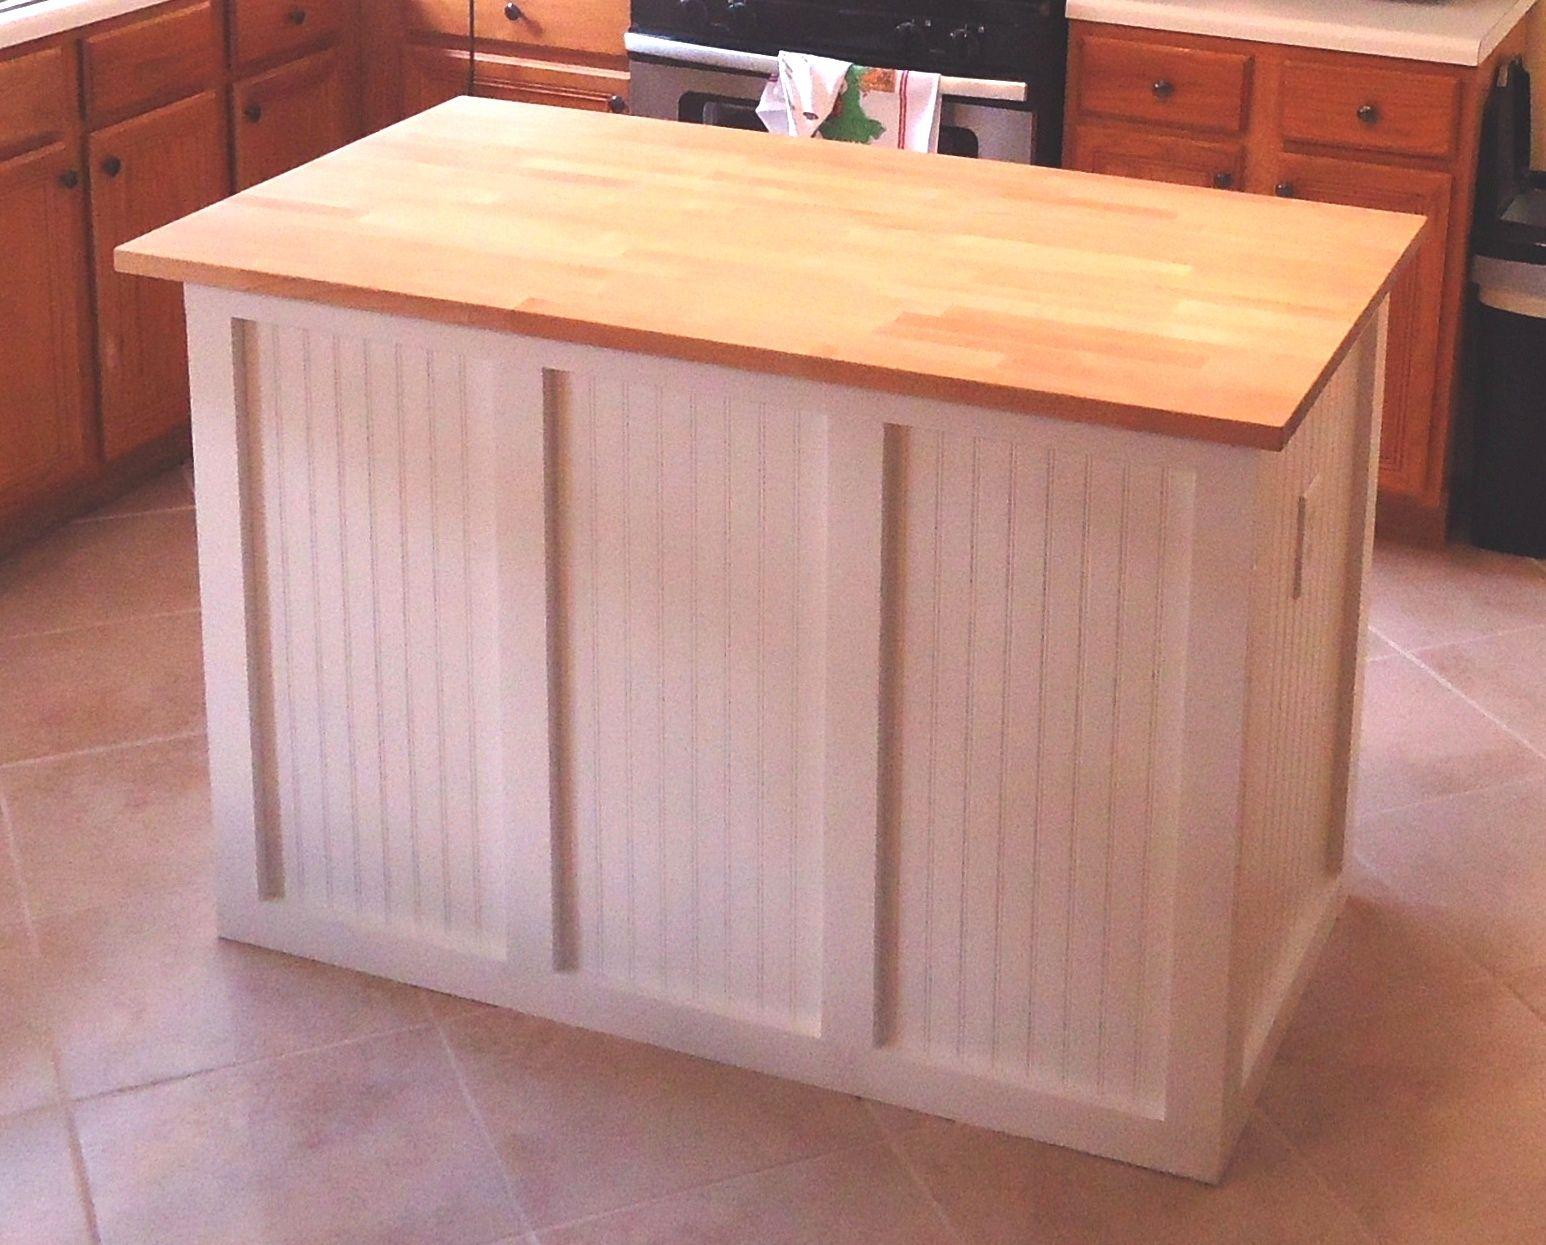 The Diy Kitchen Island Kitchen Island Cabinets Kitchen Design Diy Kitchen Island With Sink